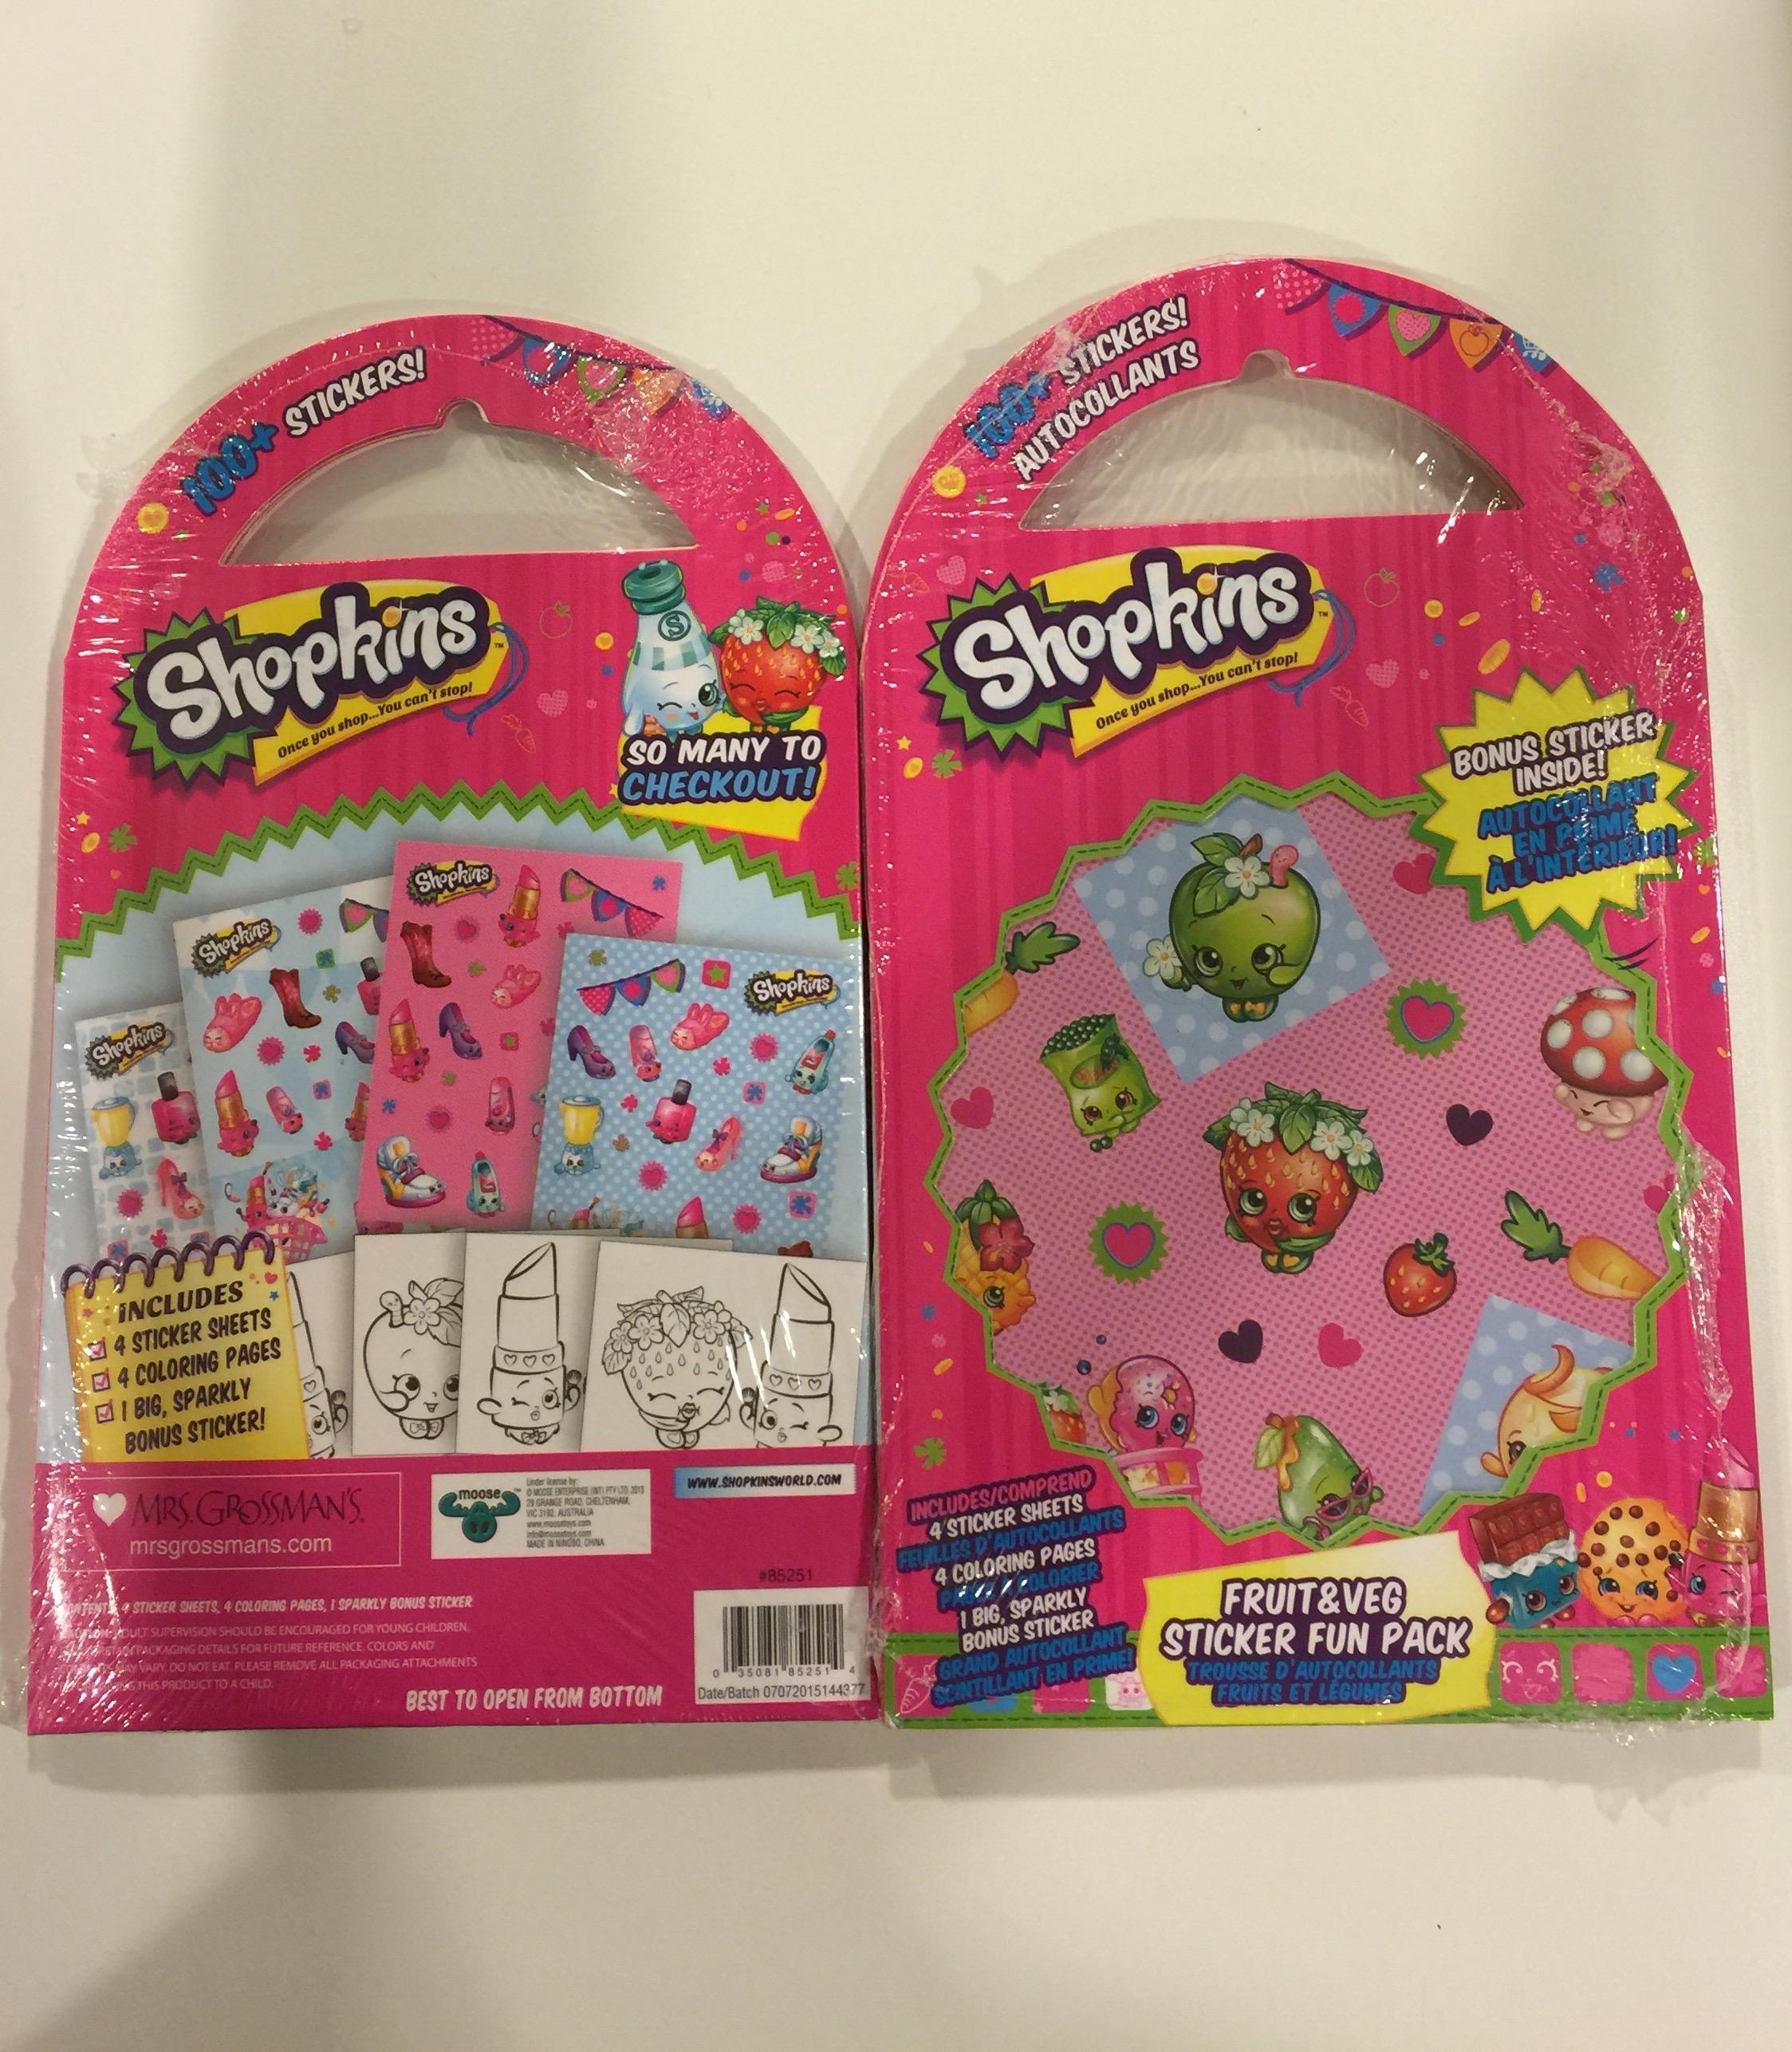 Shopkins Fruit Veg Stickers Coloring Fun Pack